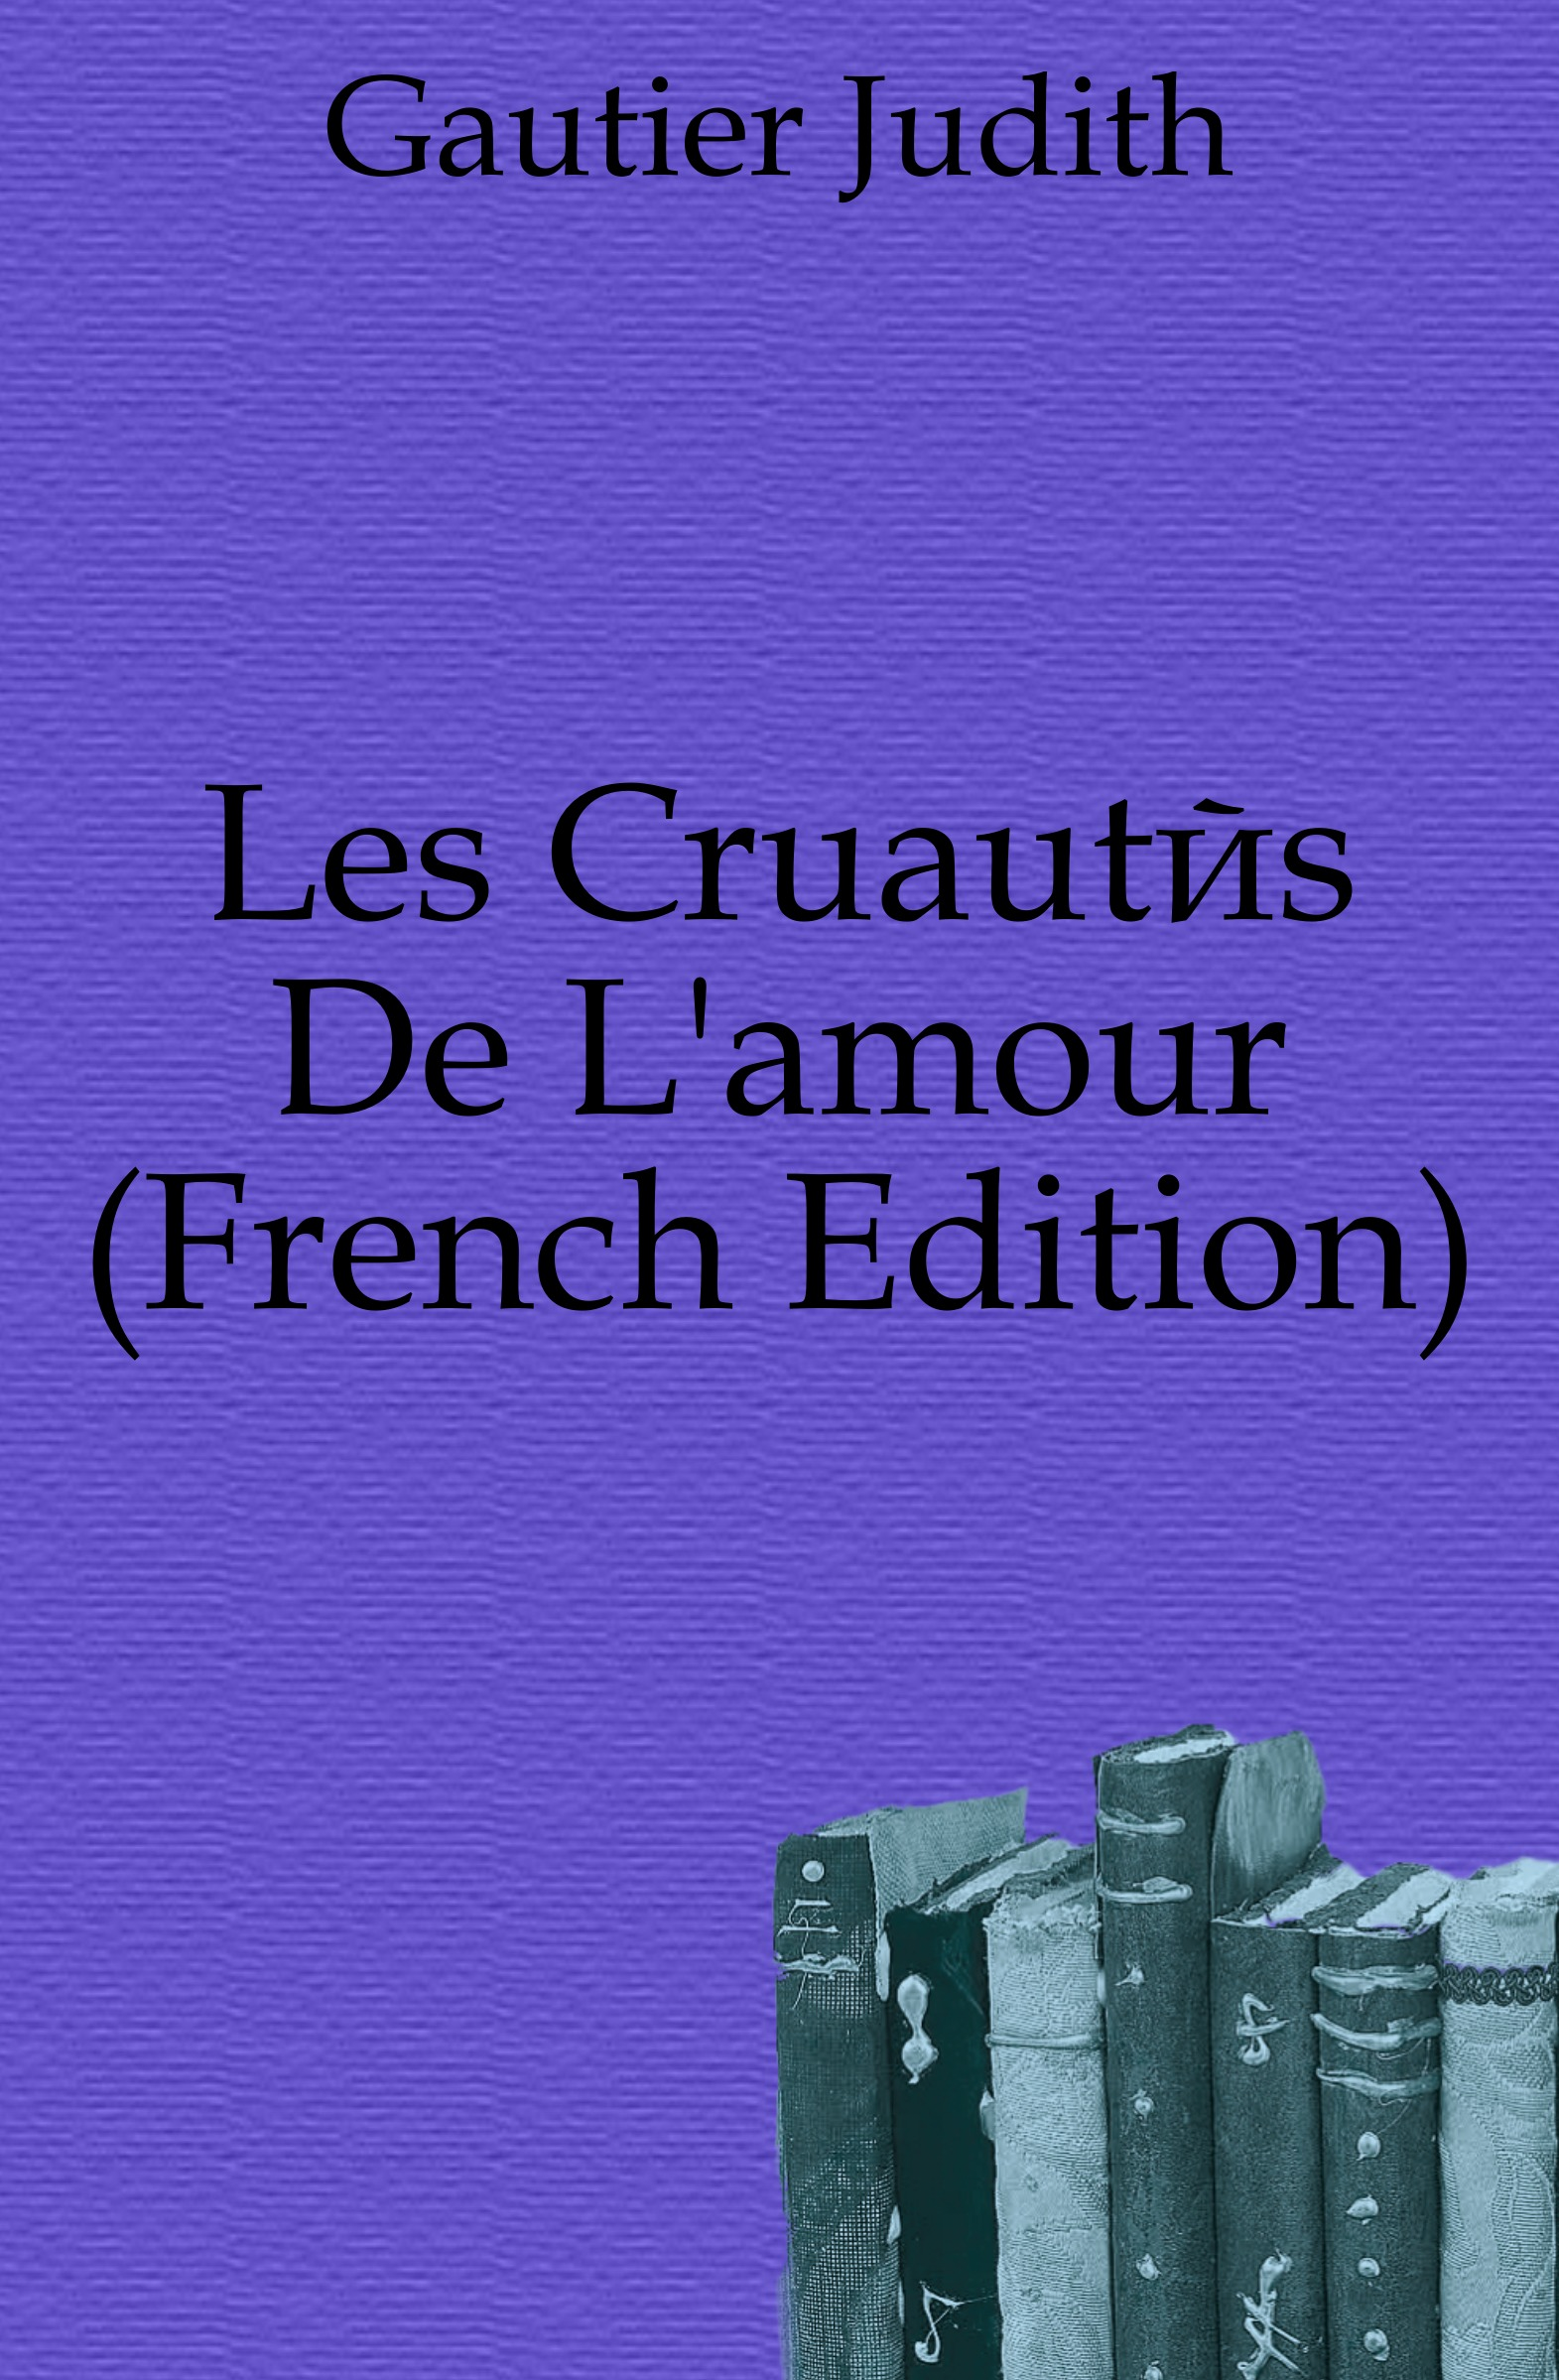 Gautier Judith Les Cruautes De L.amour (French Edition) цена и фото